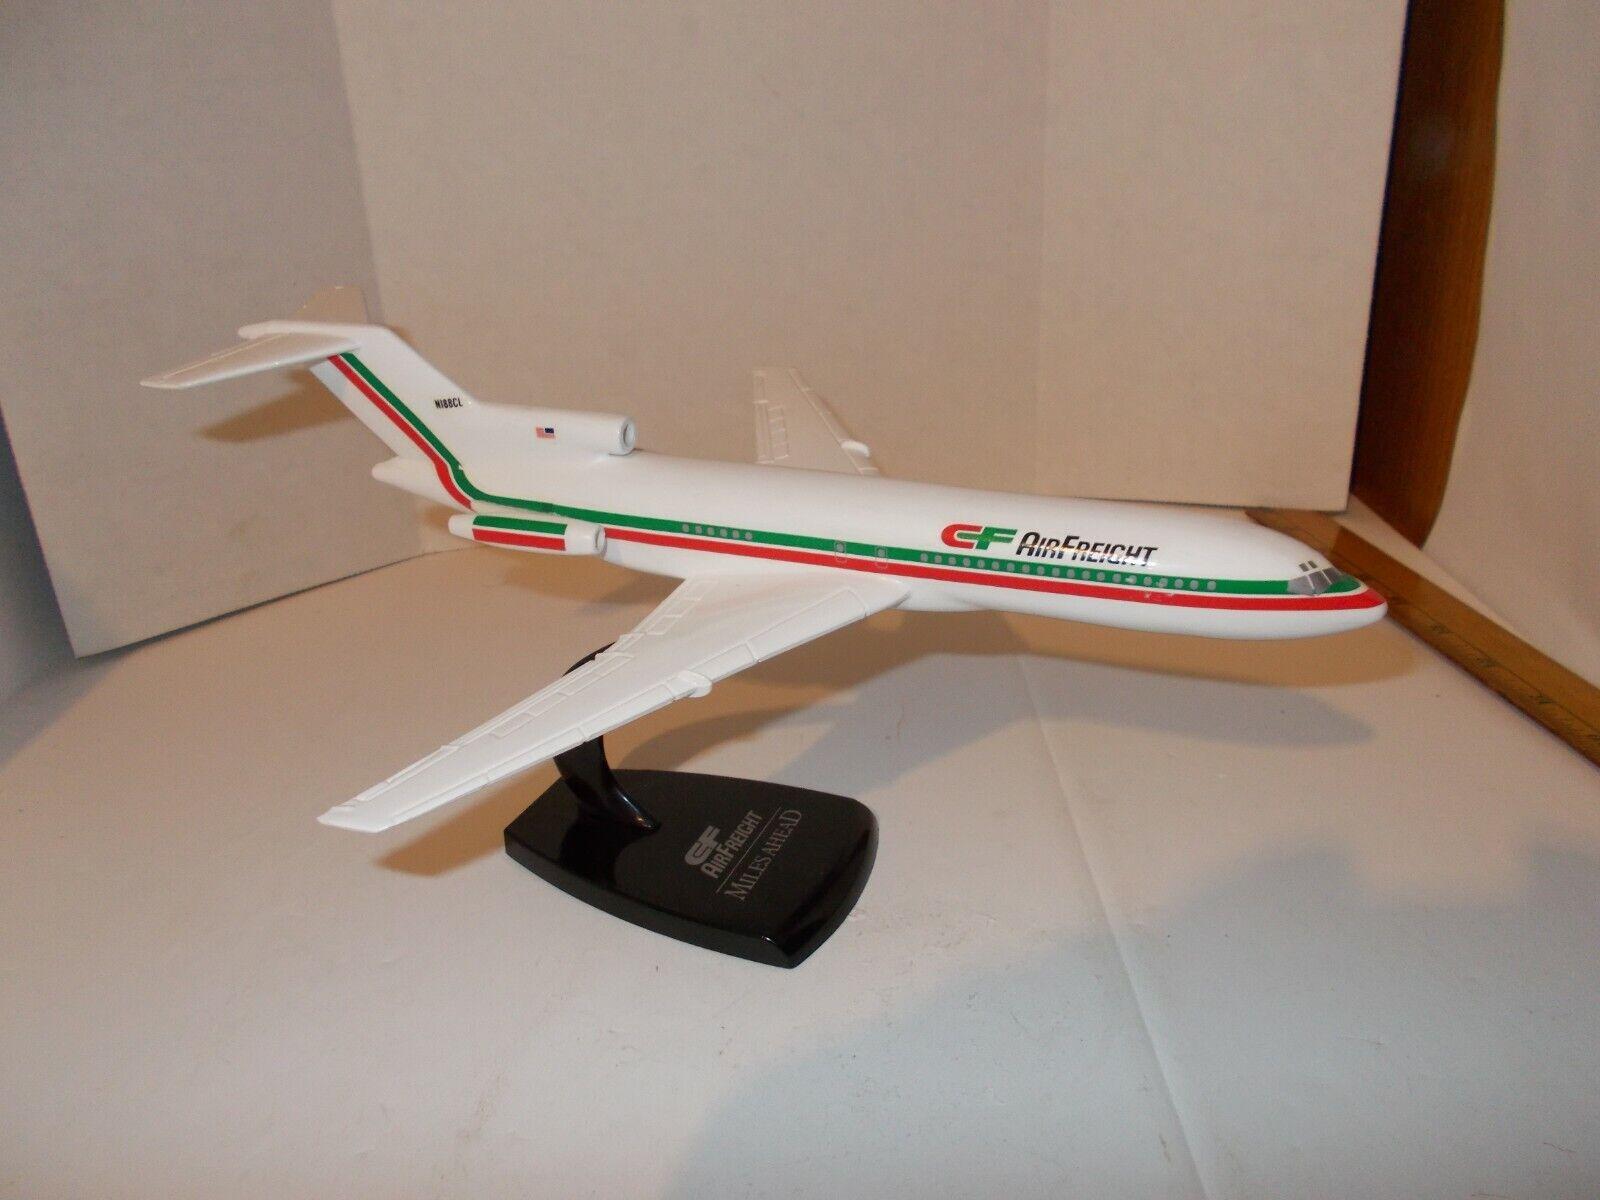 CF Air Freight Miles Ahead Desk Model Airplane